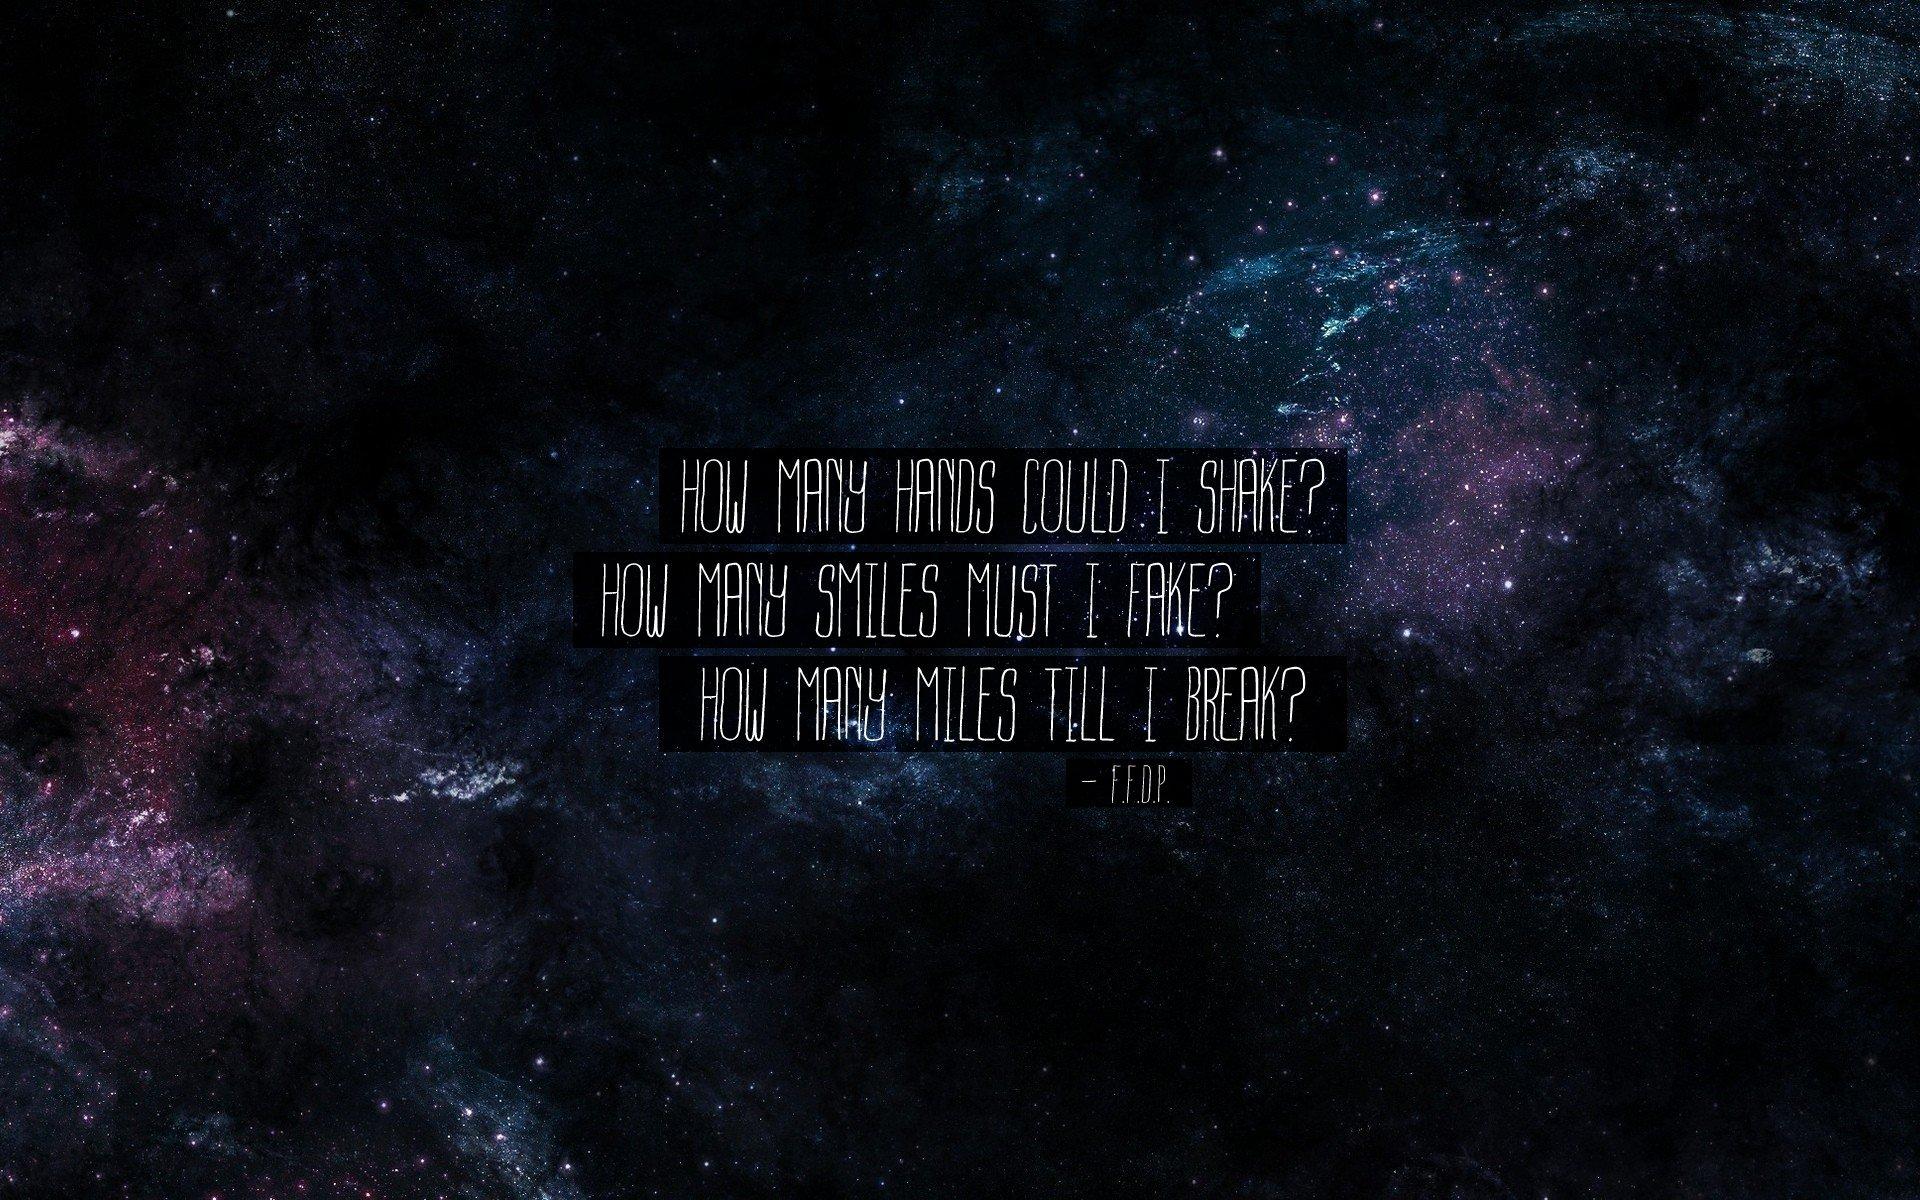 BTS Lyrics Wallpapers Wallpaper Cave